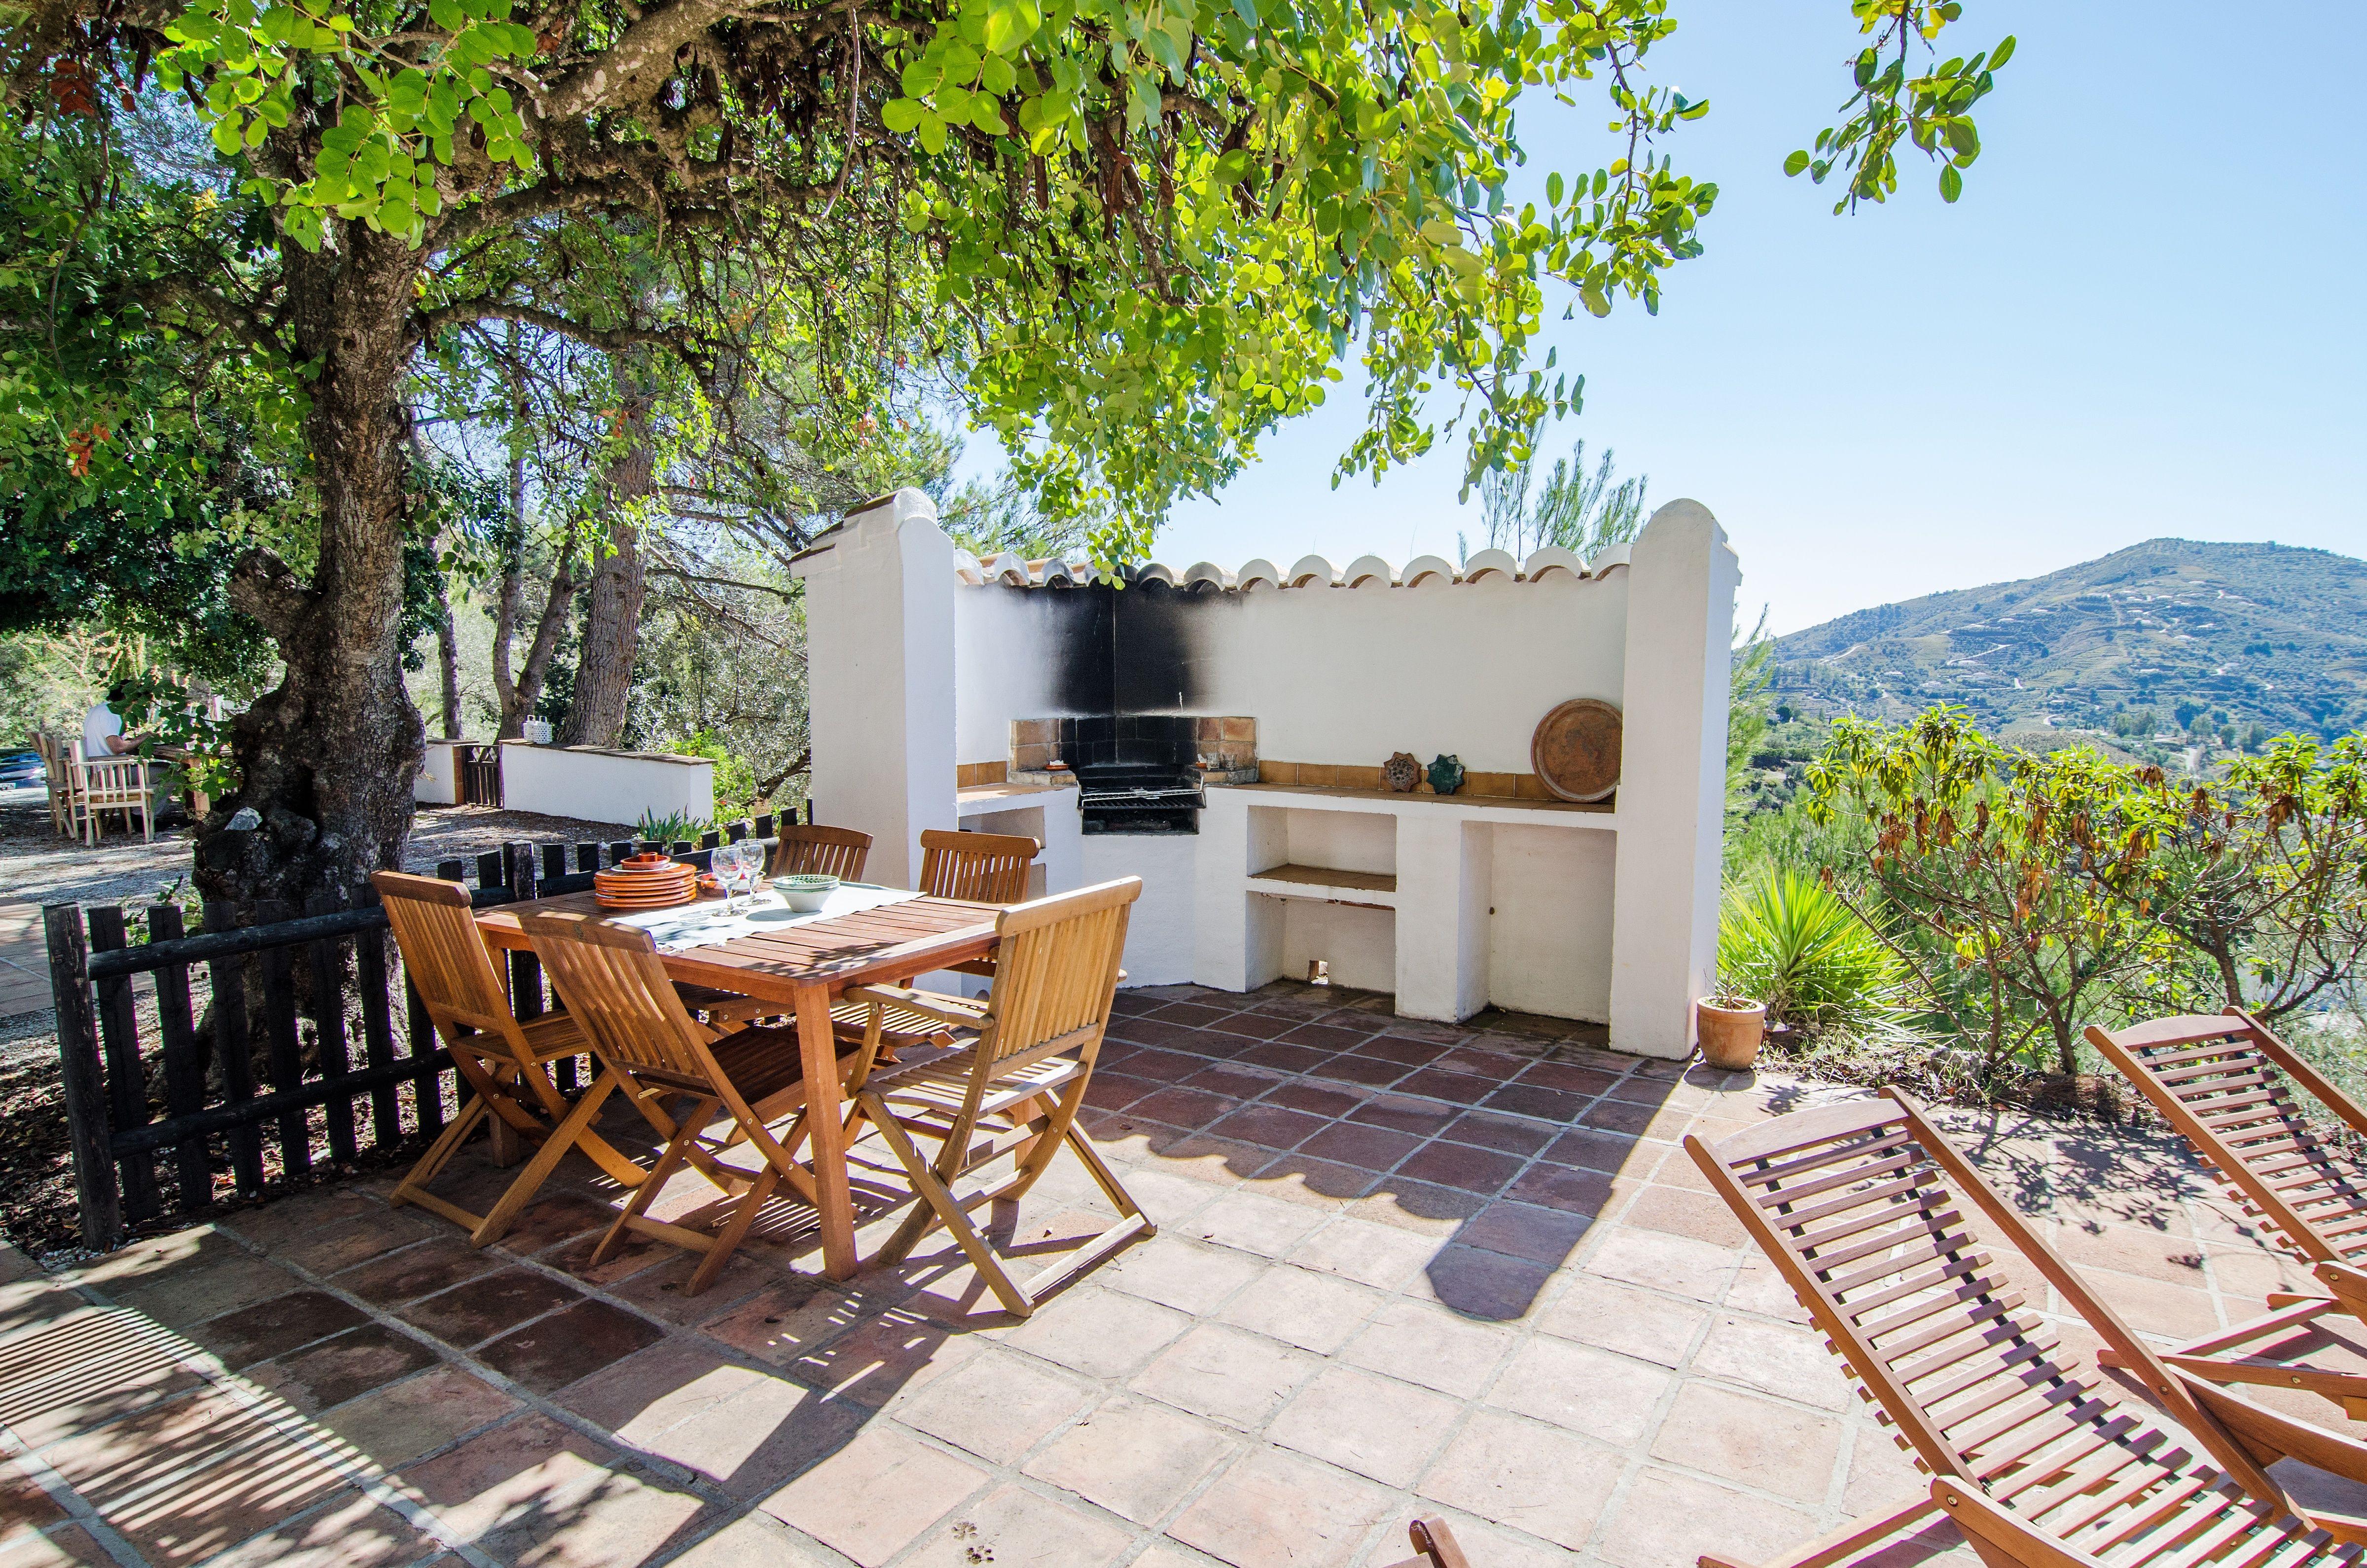 The outdoor kitchen at Holiday home Los dos Algarrobos